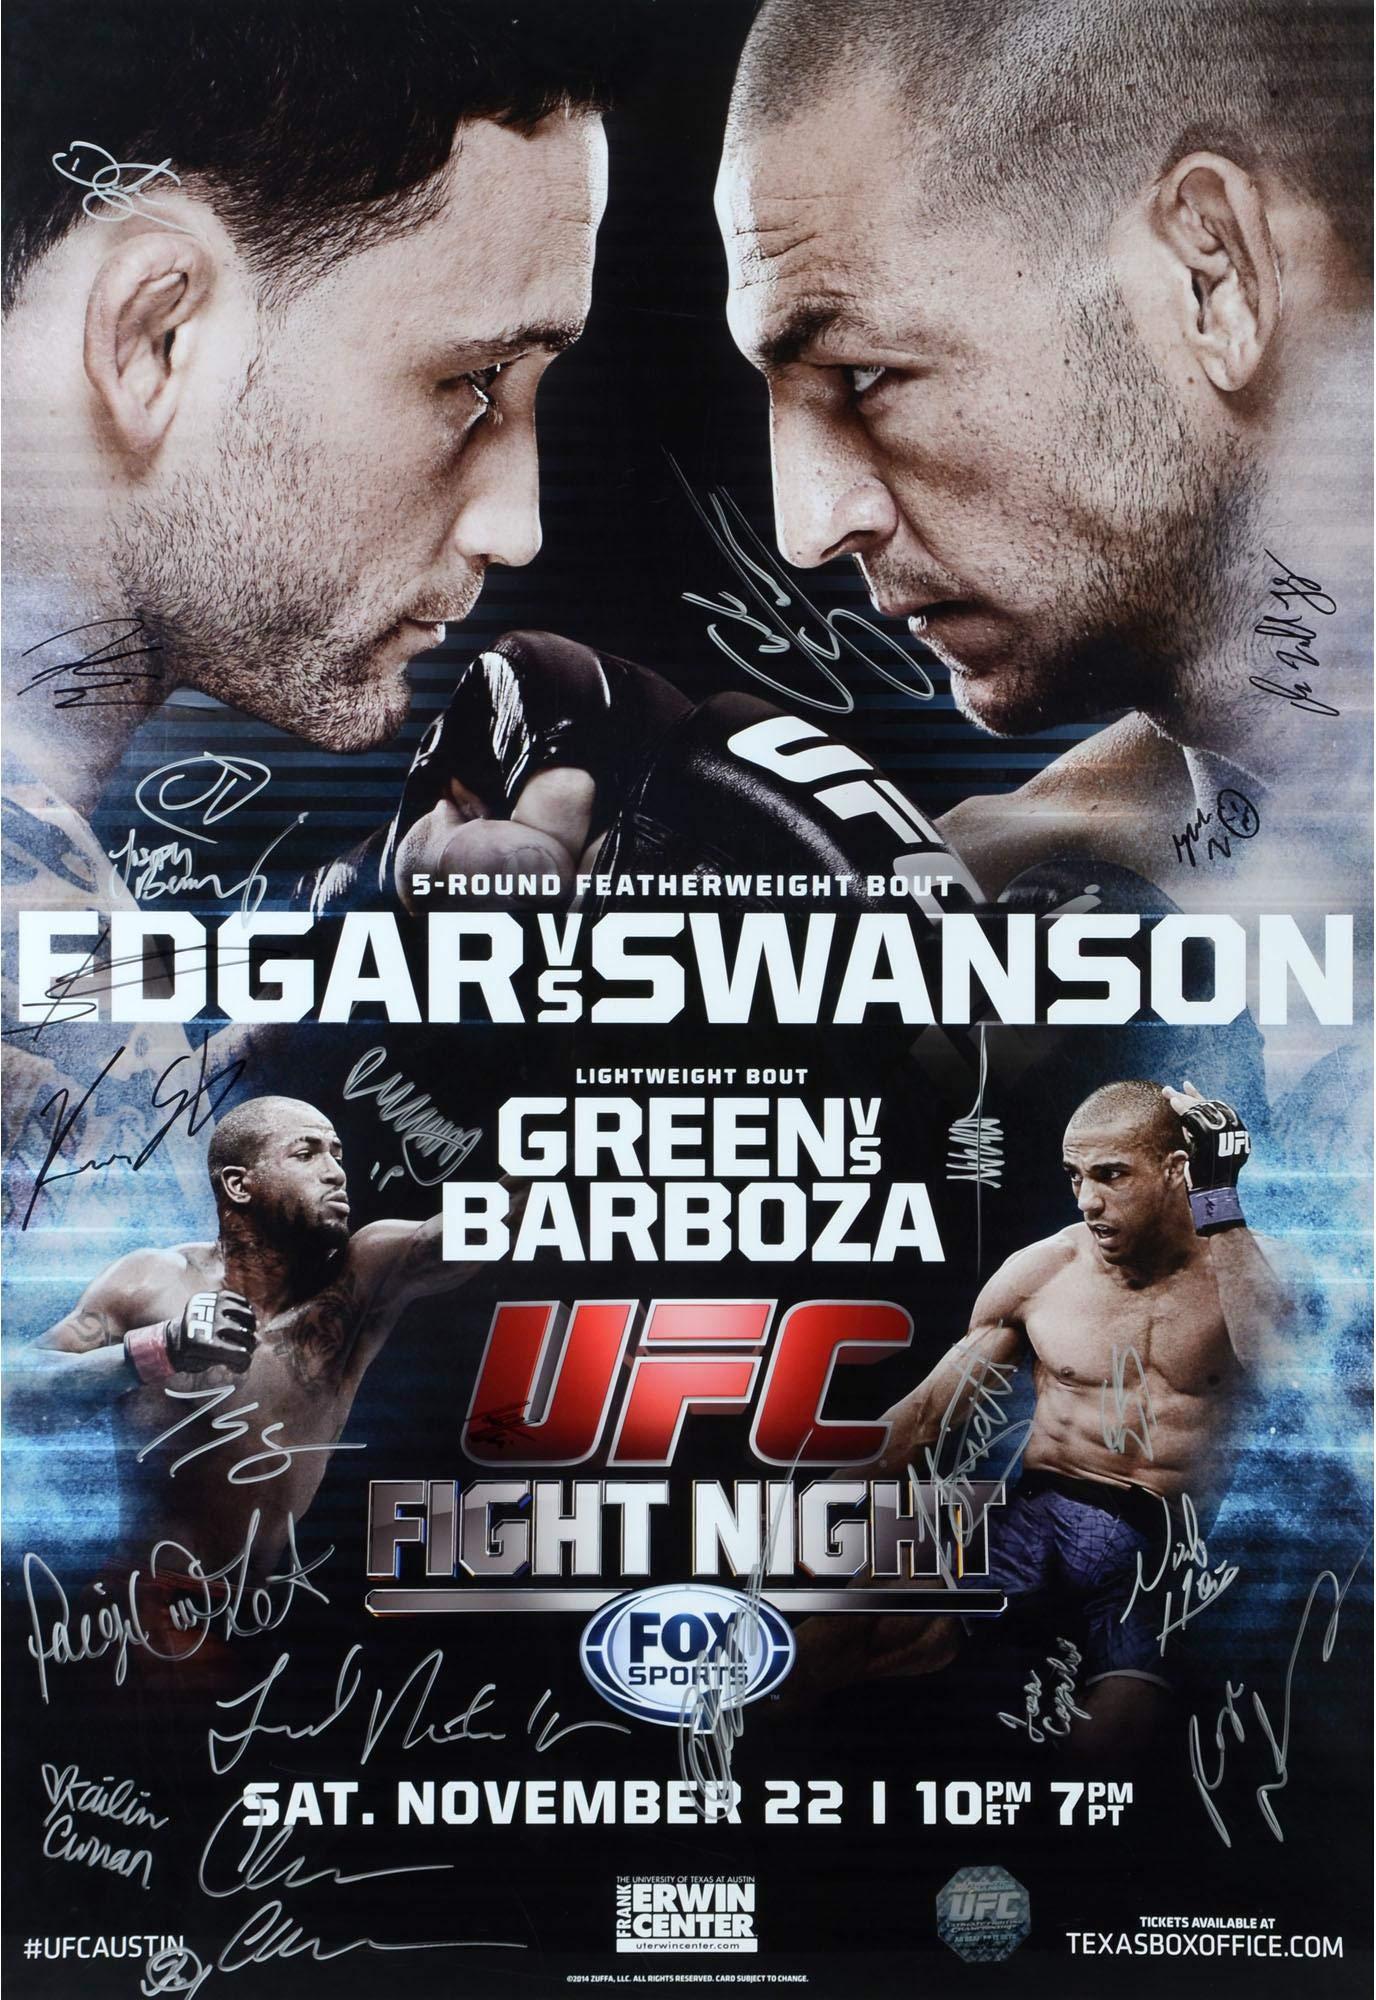 "UFC Fight Night 57 Edgar vs. Swanson Autographed 27"" x 39"" 24 Signature Event Poster Fanatics Authentic Certified"